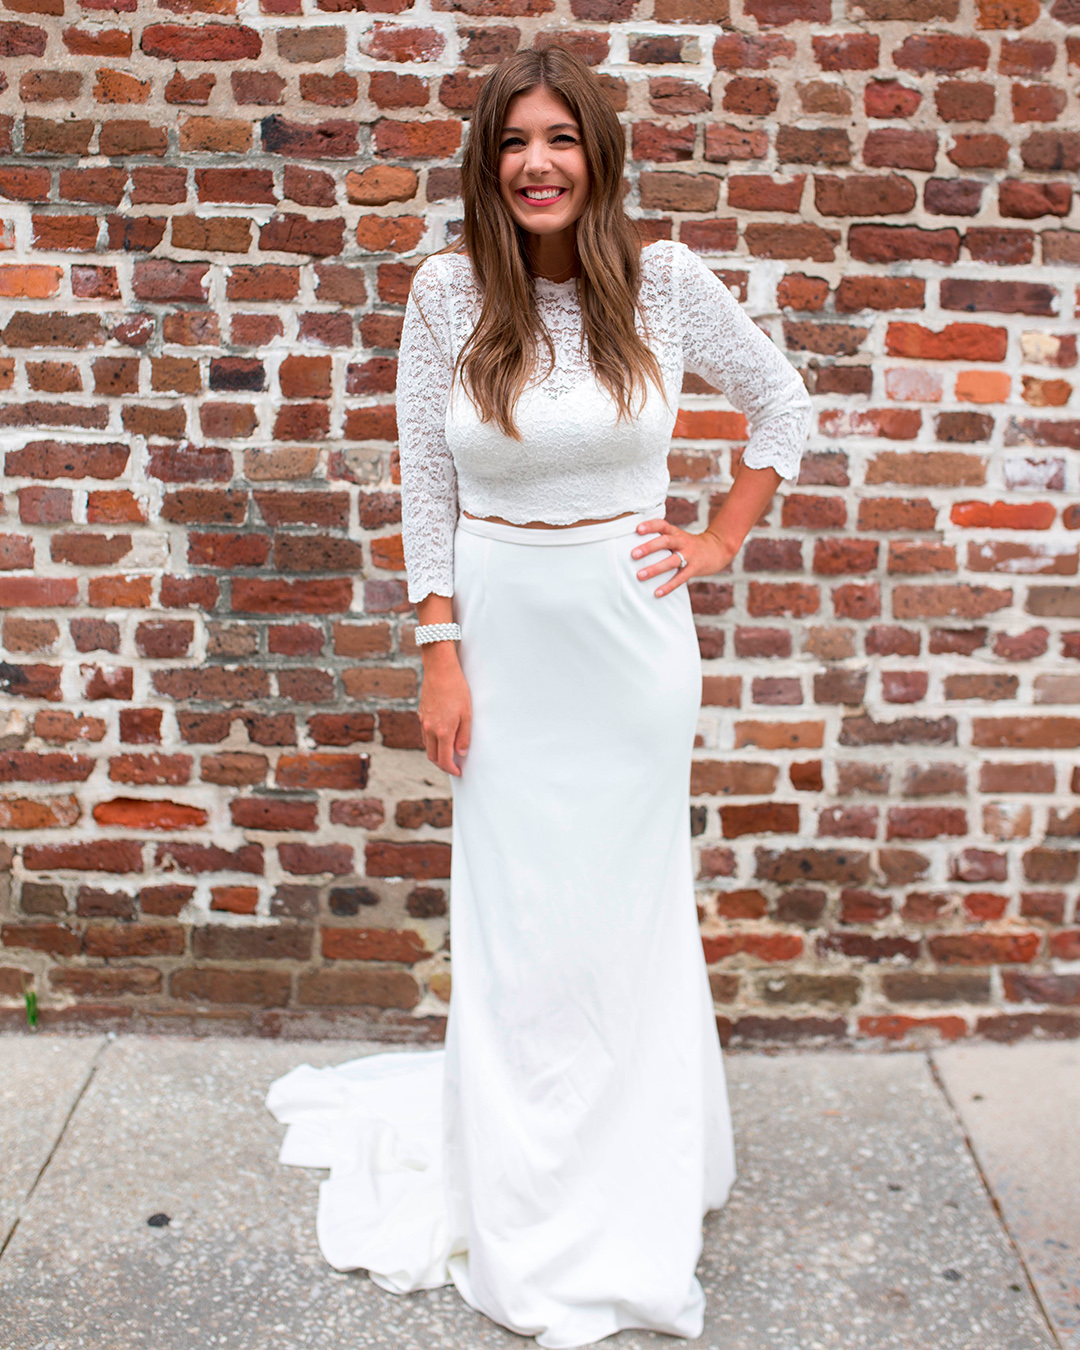 bride in two piece wedding dress